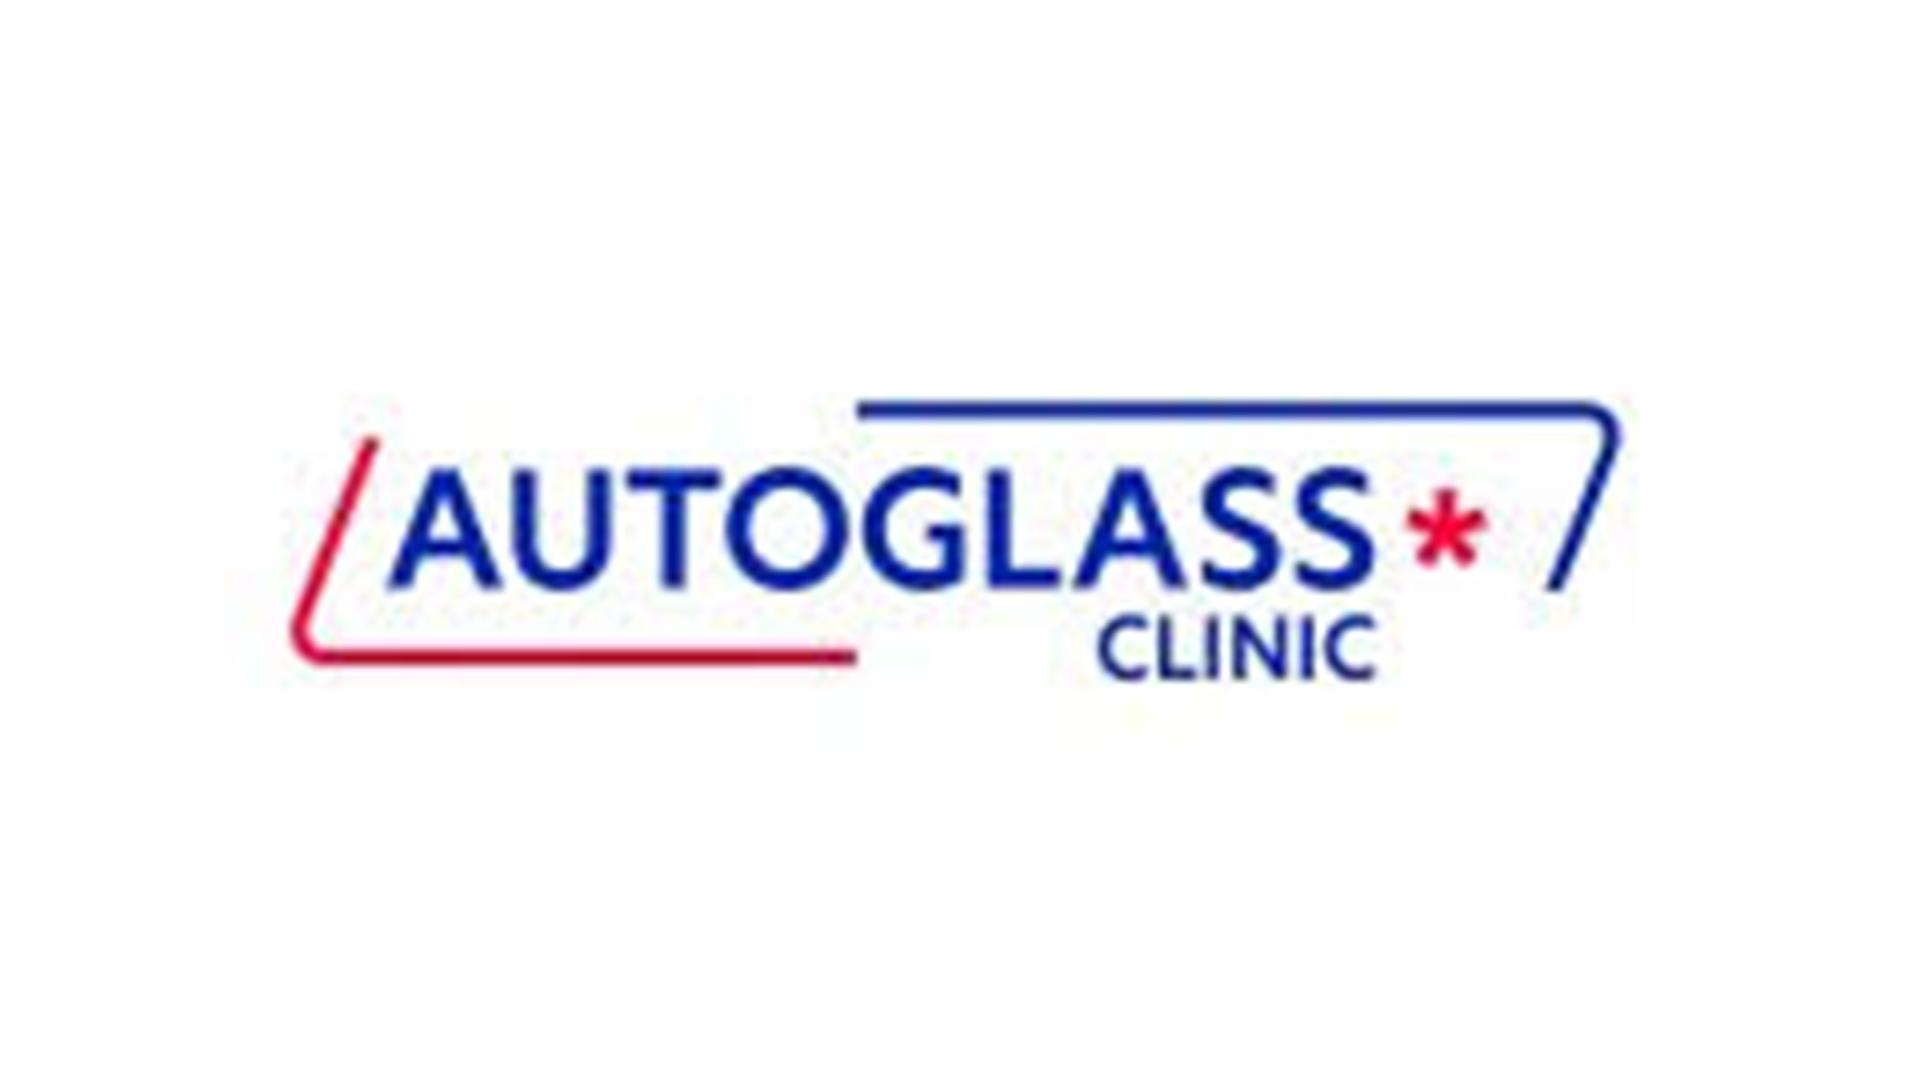 Logo Autoglassclinic Aquilae